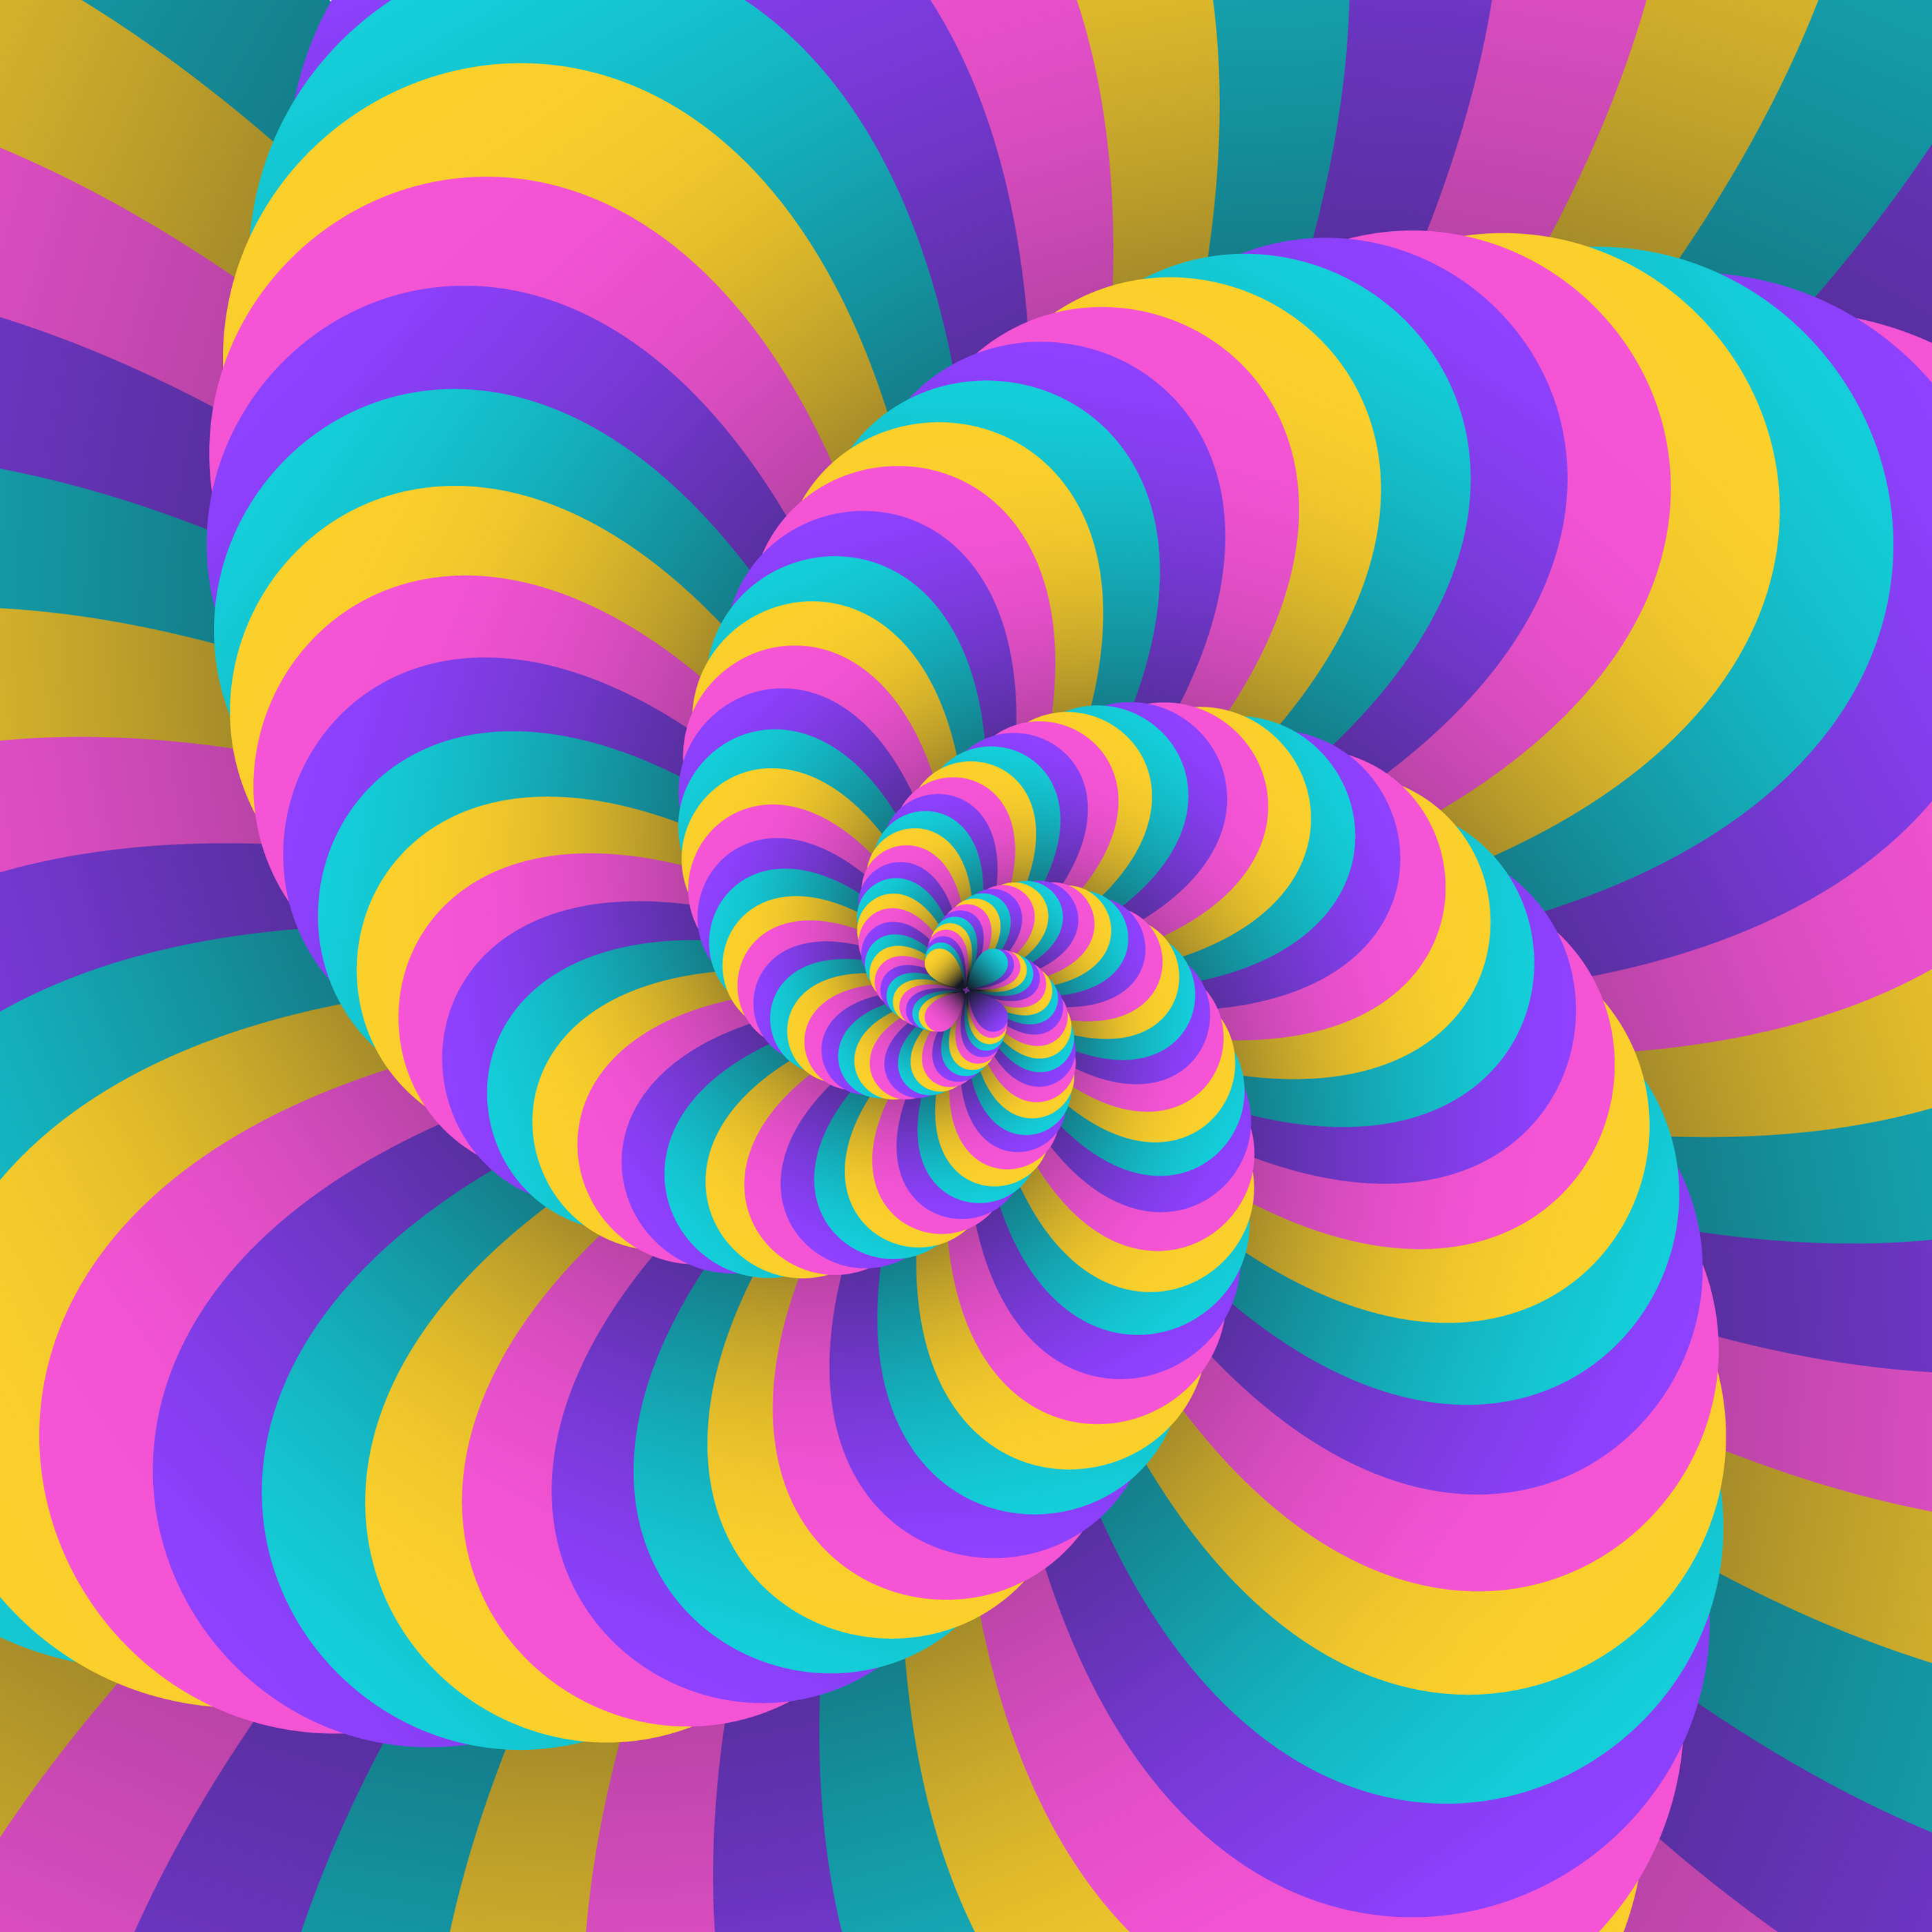 3D Swirl Circular Movement Illusion Background